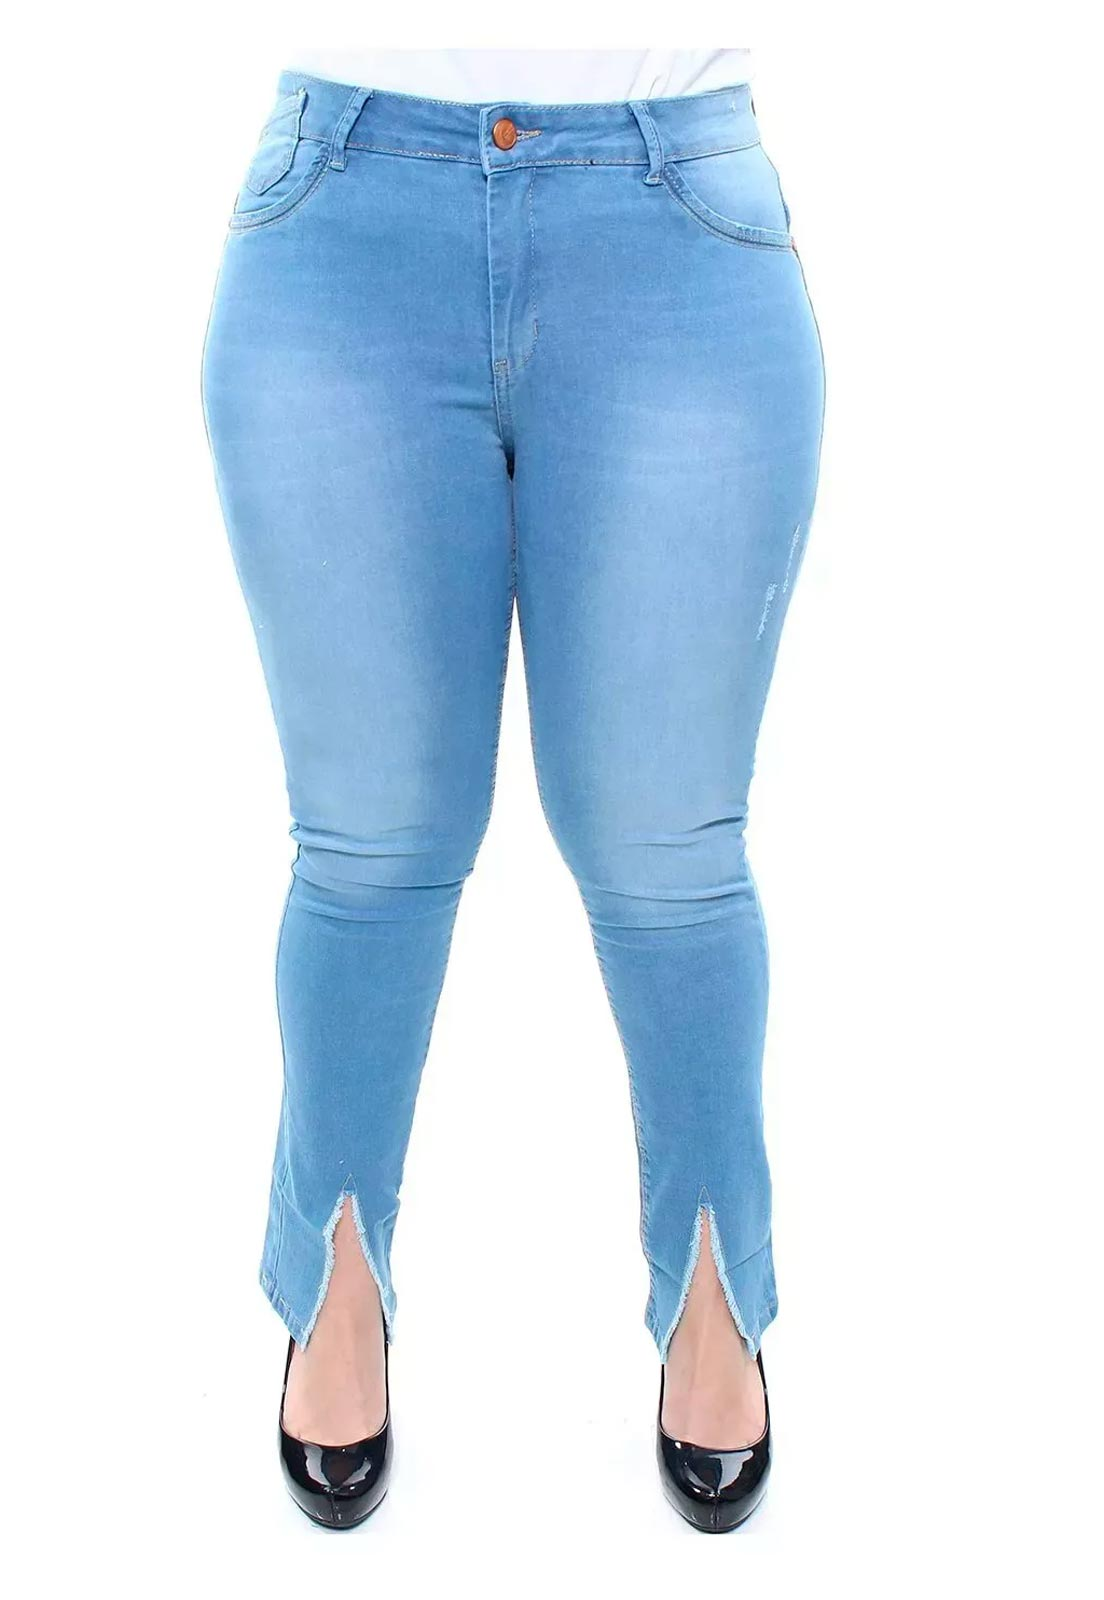 Calça Jeans Plus Size Feminina Skinny Destroyed Crocker - 47538  - CROCKER JEANS